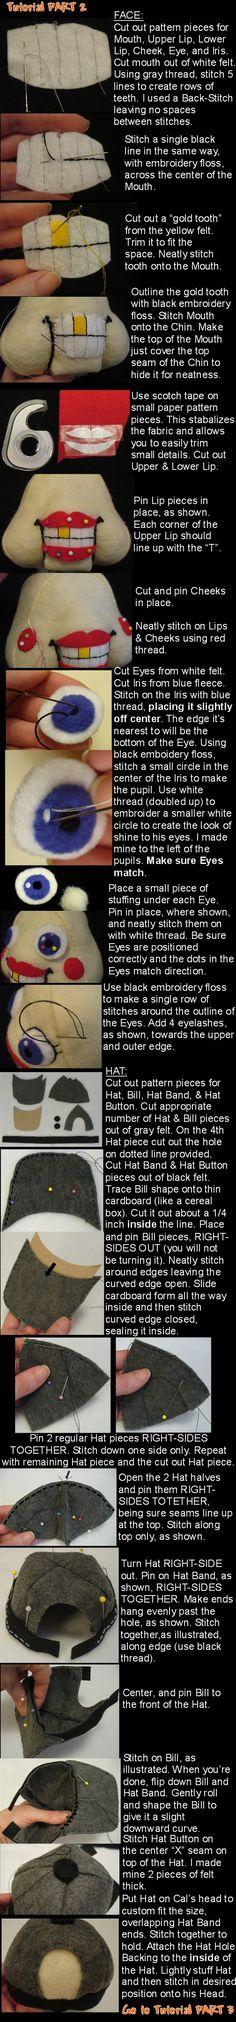 Lil Cal sewing tutorial Part 2 by lishlitz.deviantart.com on @deviantART